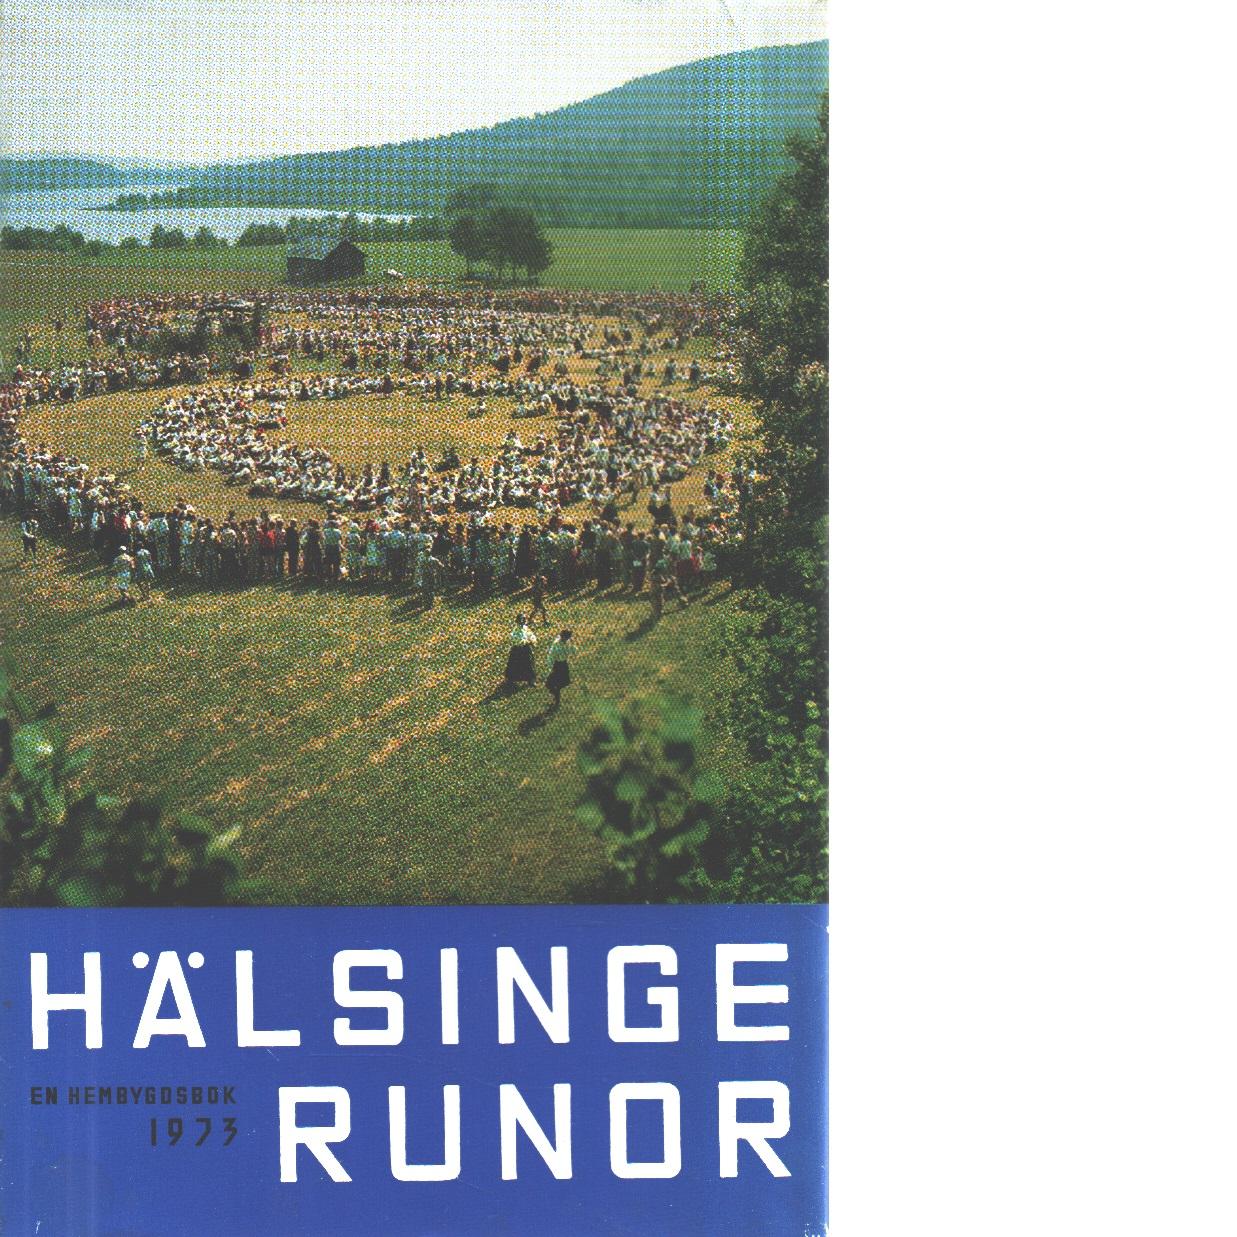 Hälsingerunor 1973 - Red.